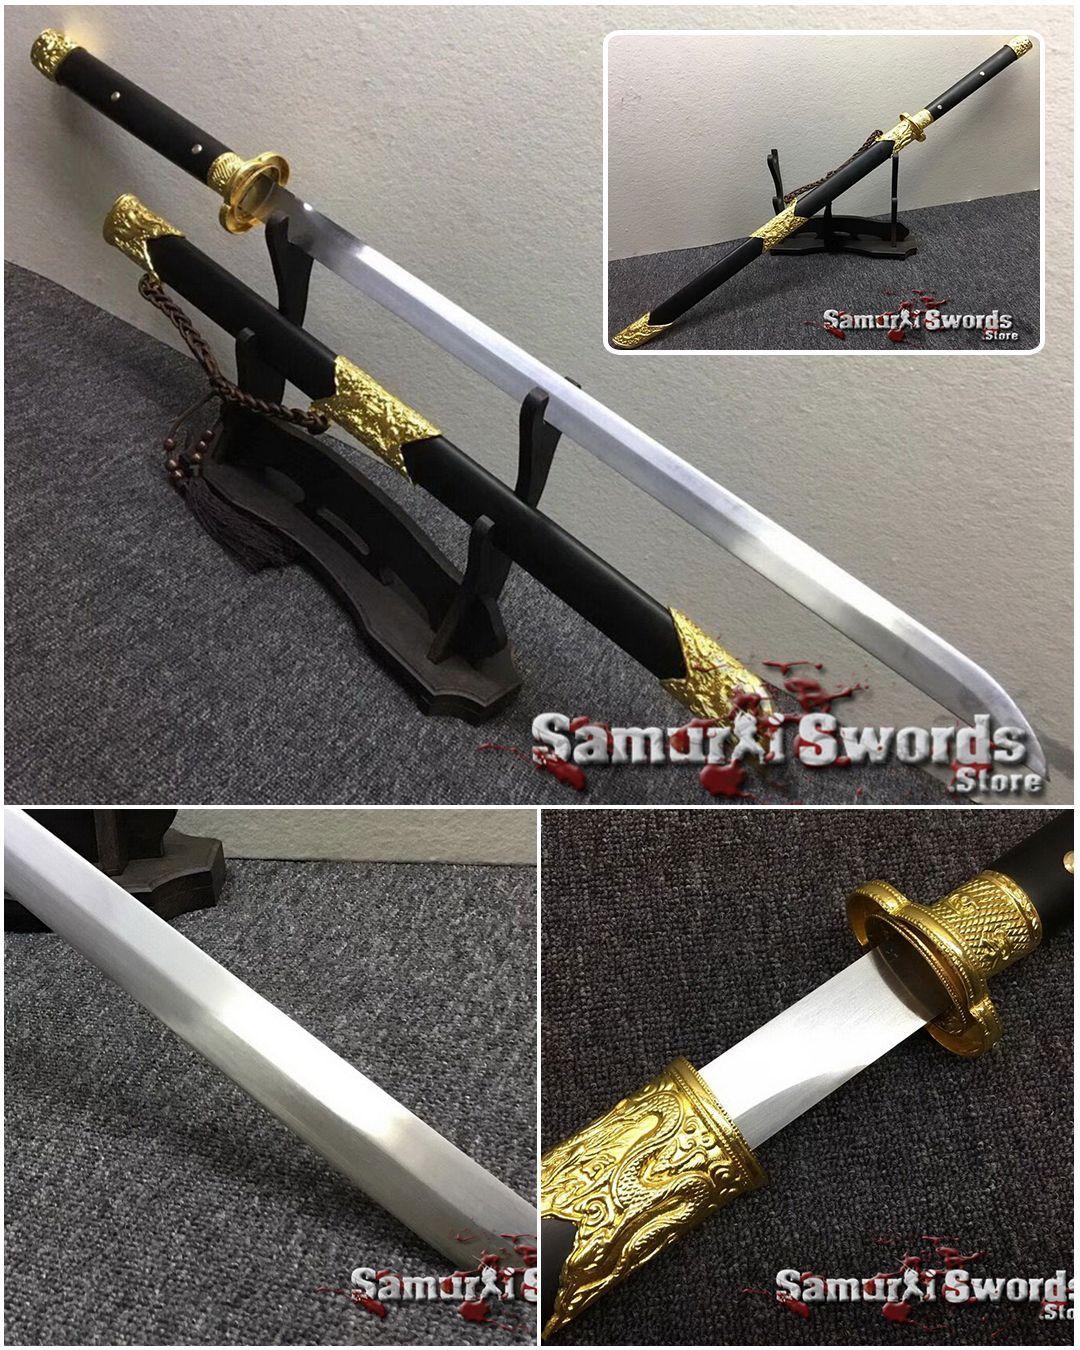 Chinese Jian Sword 9260 Spring Steel Ebony Wood Scabbard Spring Steel Sword Ebony Wood